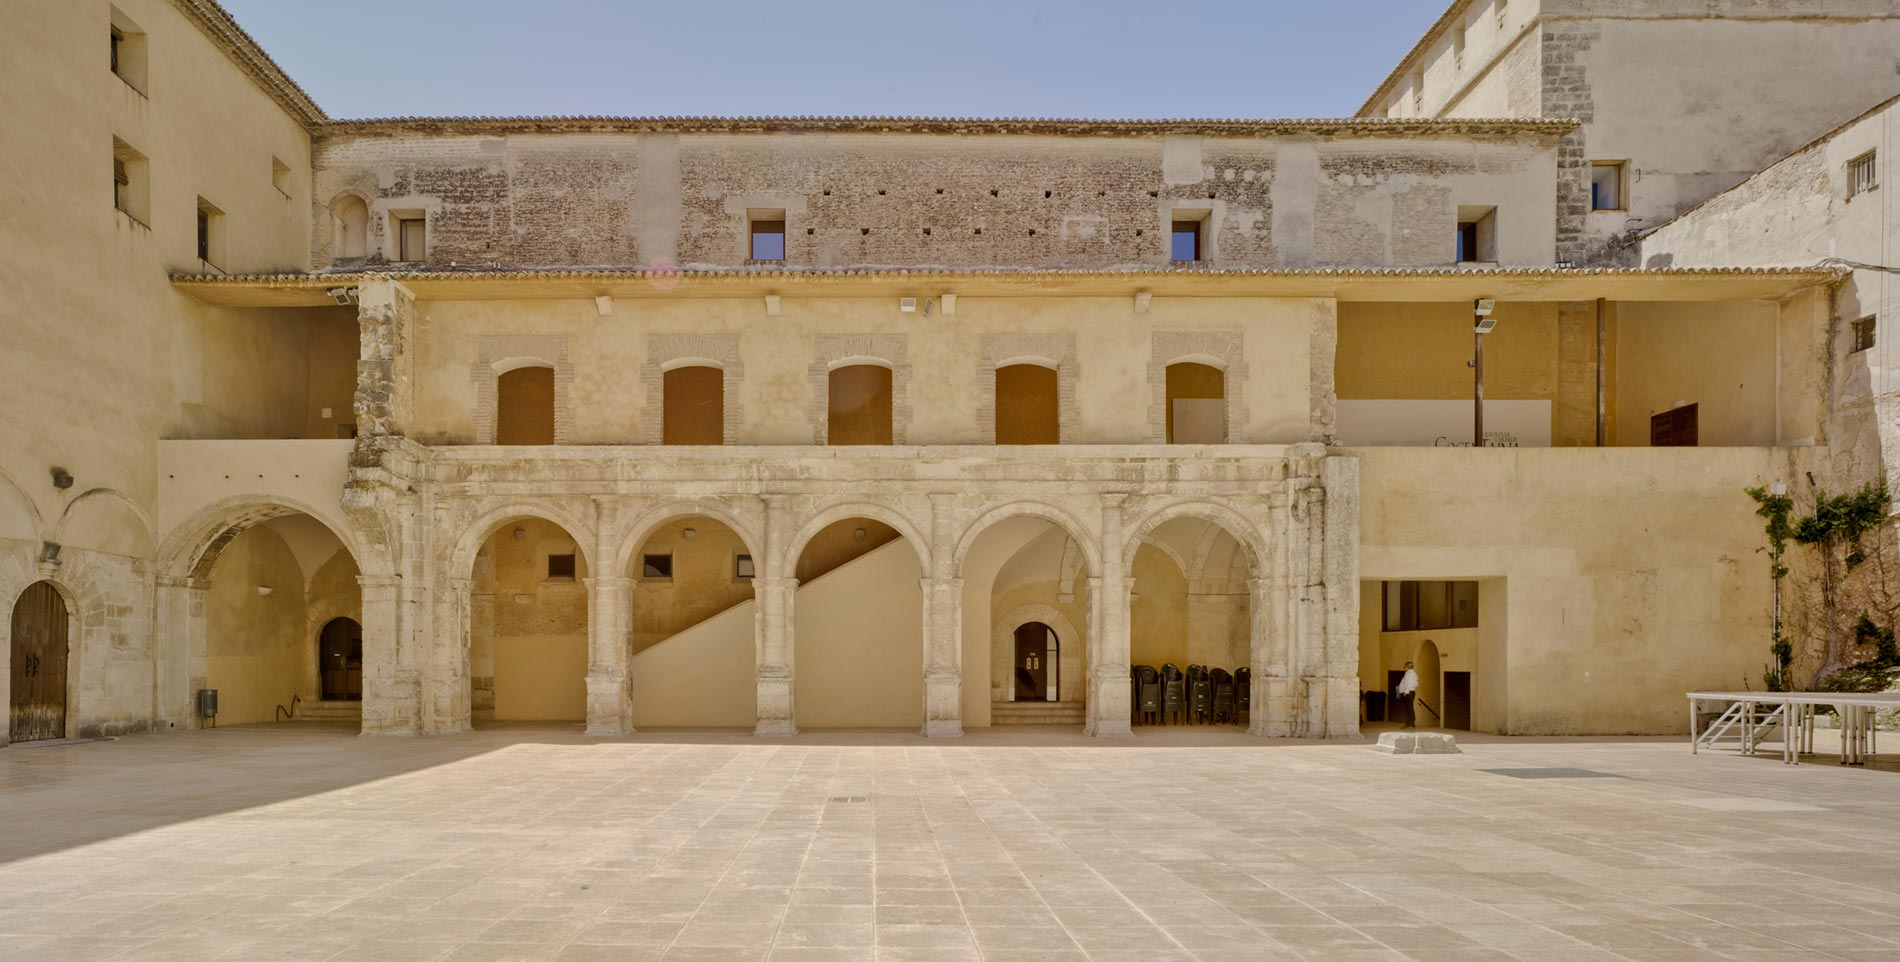 Palacio condal de cocentaina pavex colours project - Cocentaina espana ...